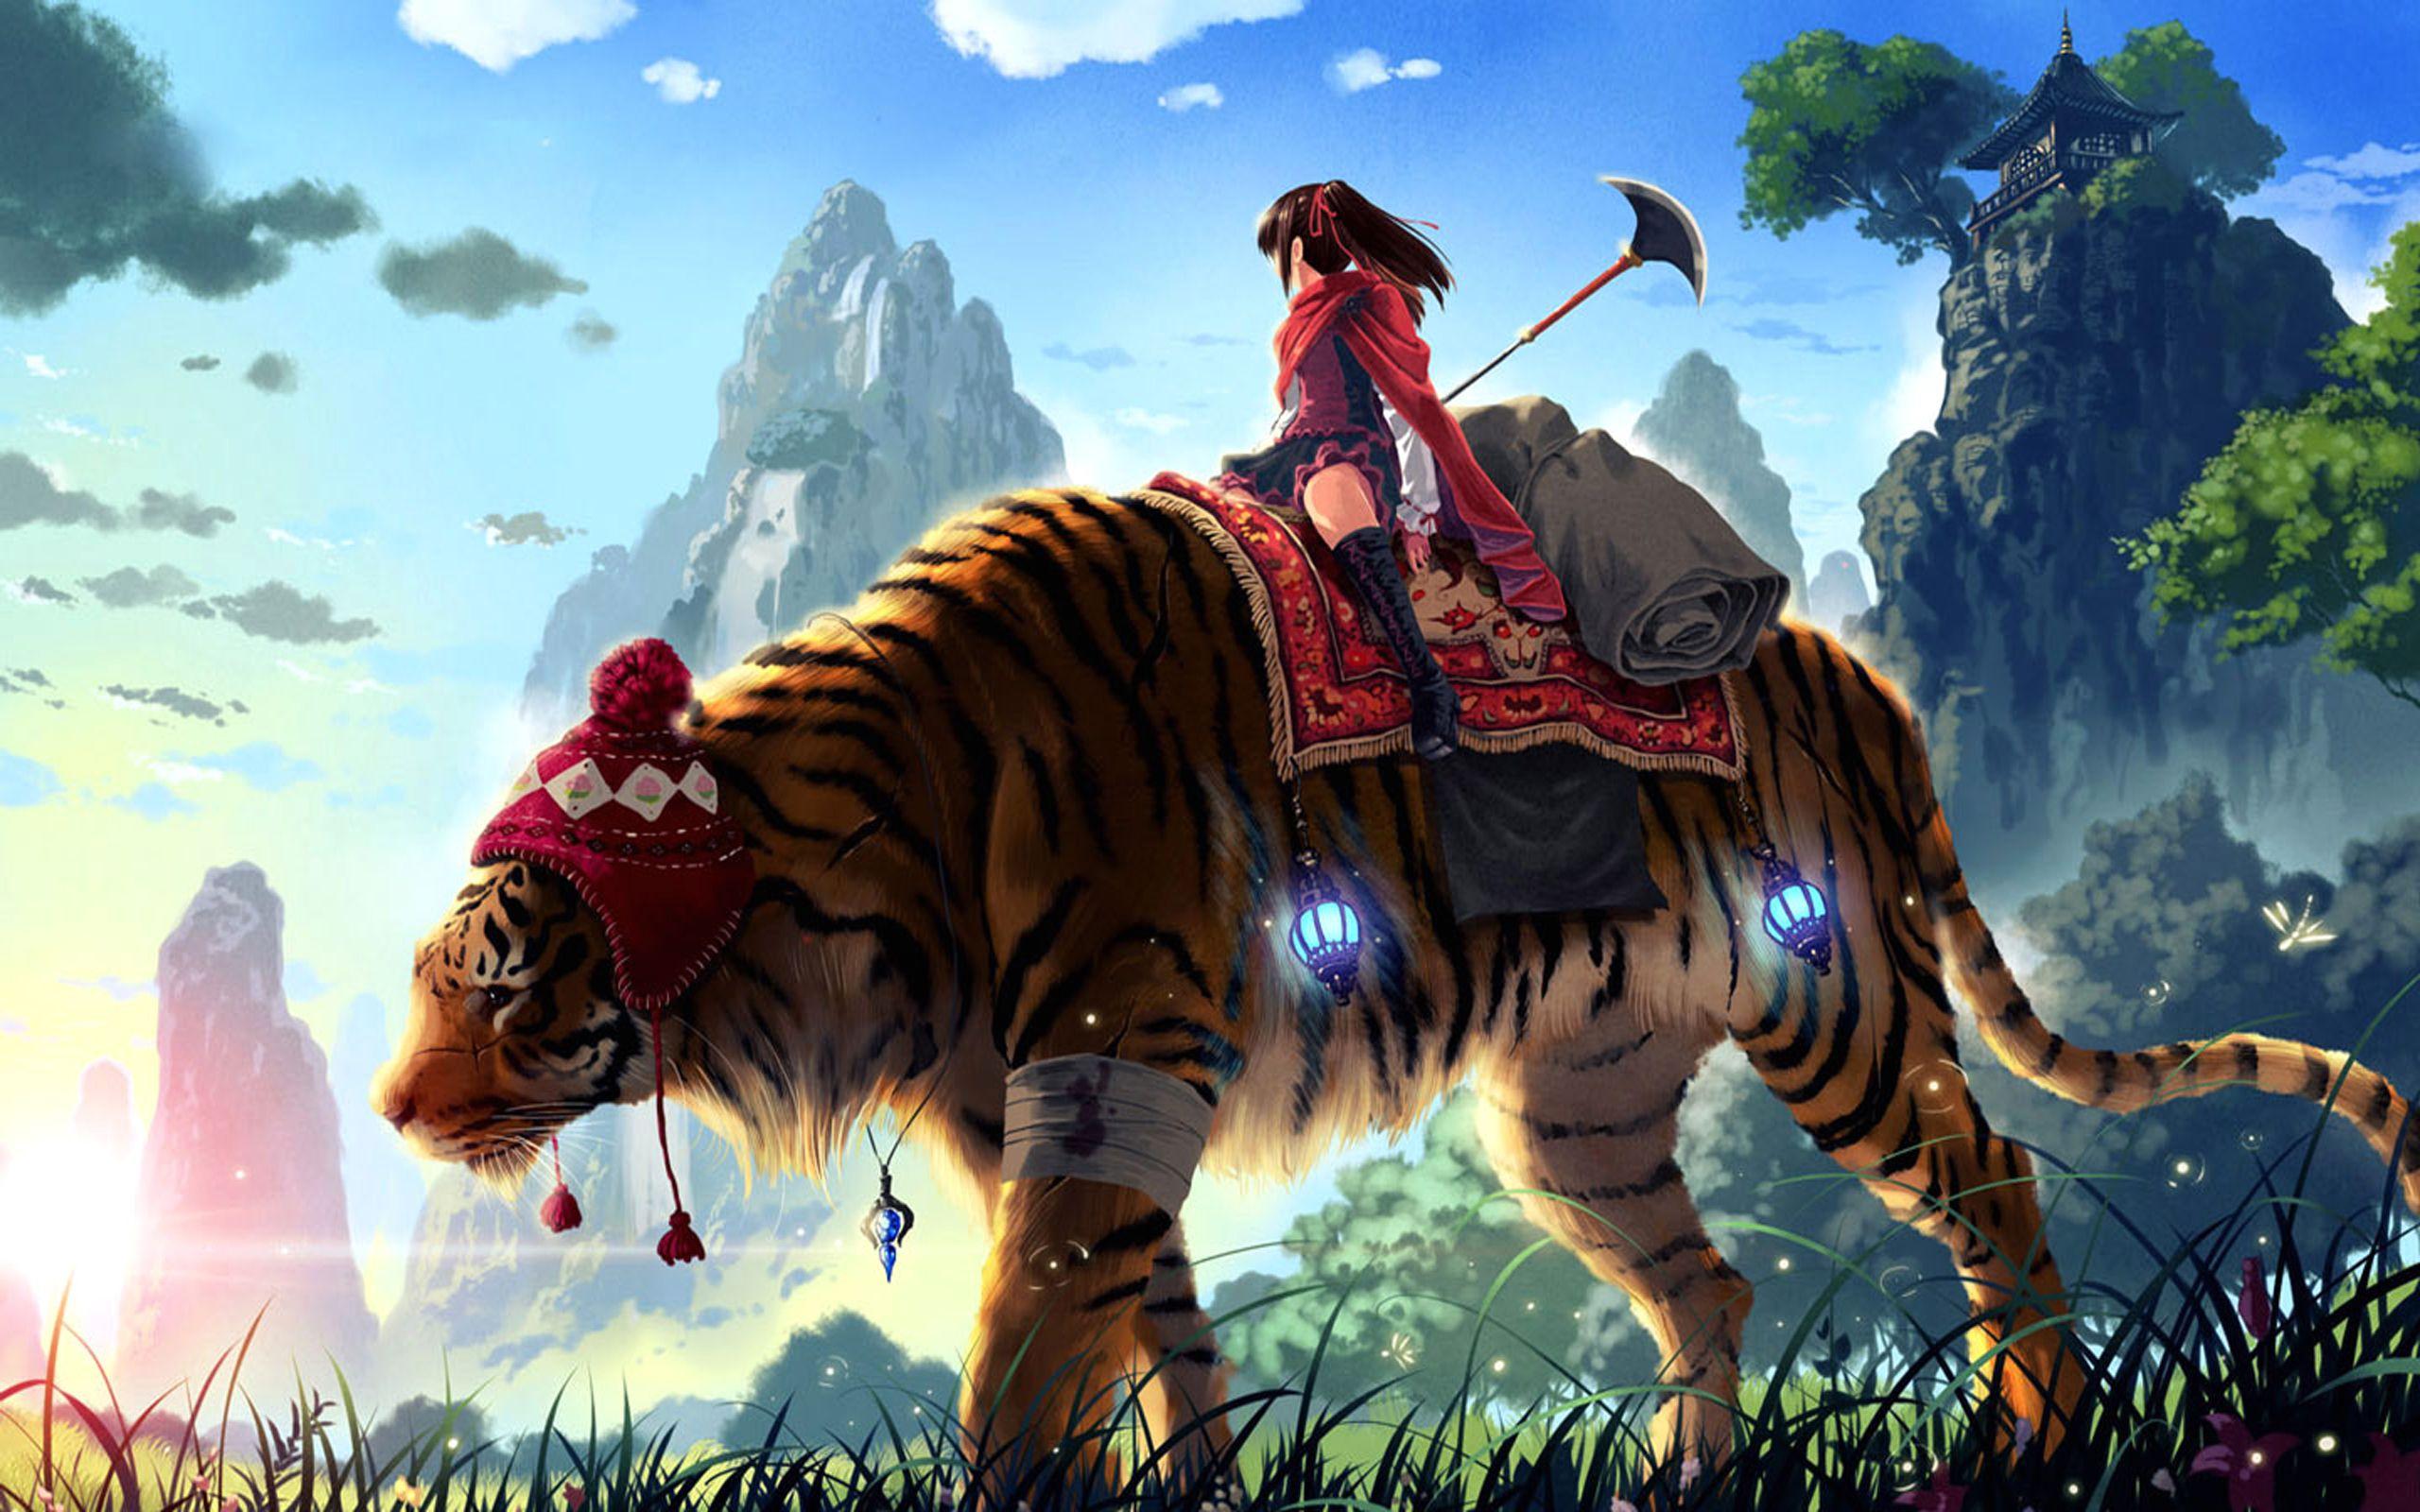 Anime Original Girl Tiger Journey Wallpaper